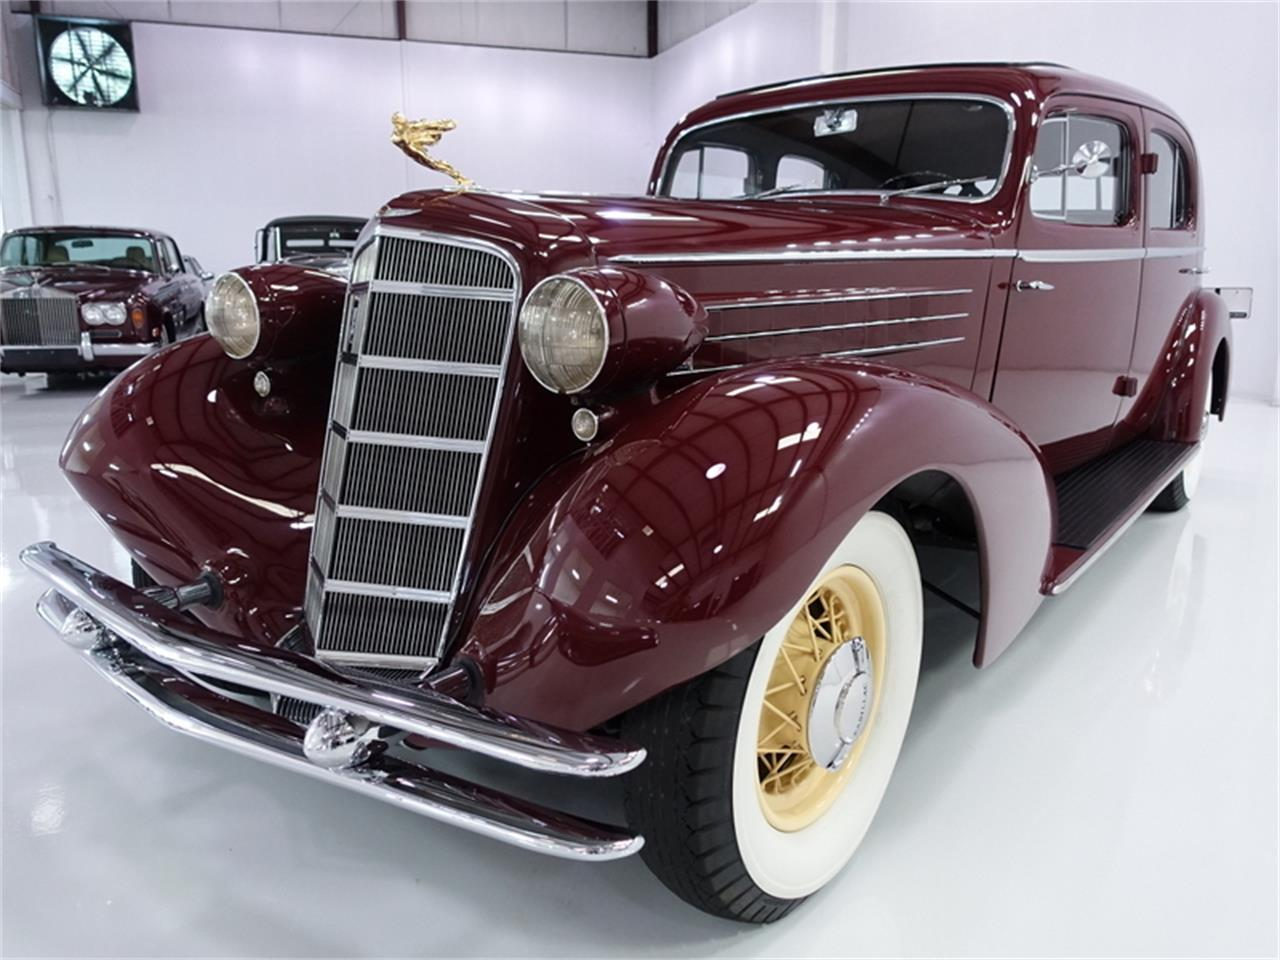 1934 Cadillac Town Sedan for Sale   ClassicCars.com   CC ...